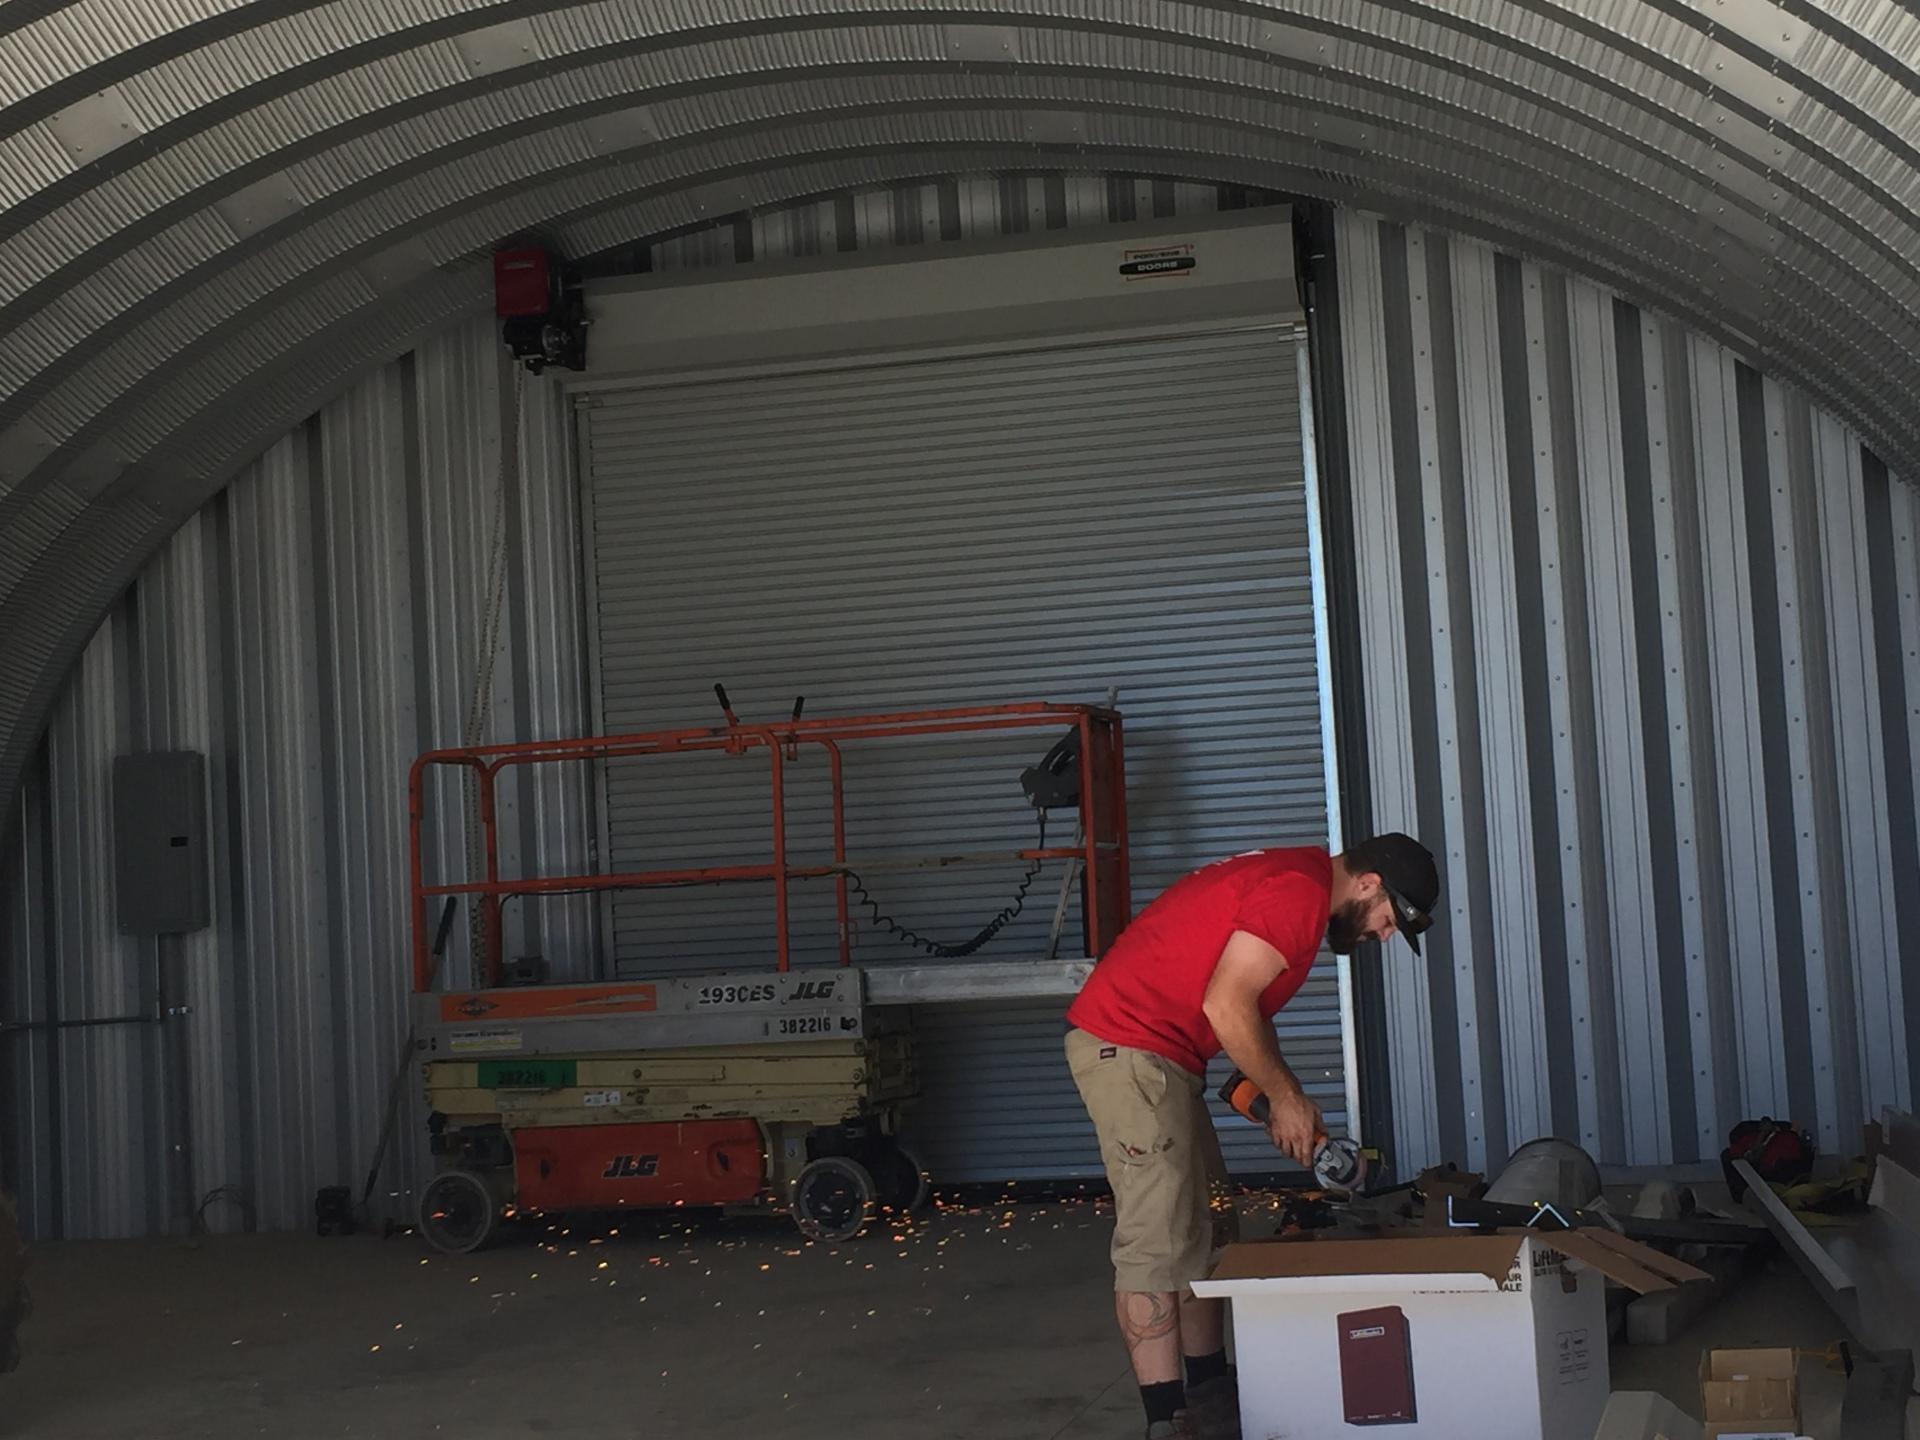 Porvene 424 Flat Slat Commercial Roll up with Liftmaster opener